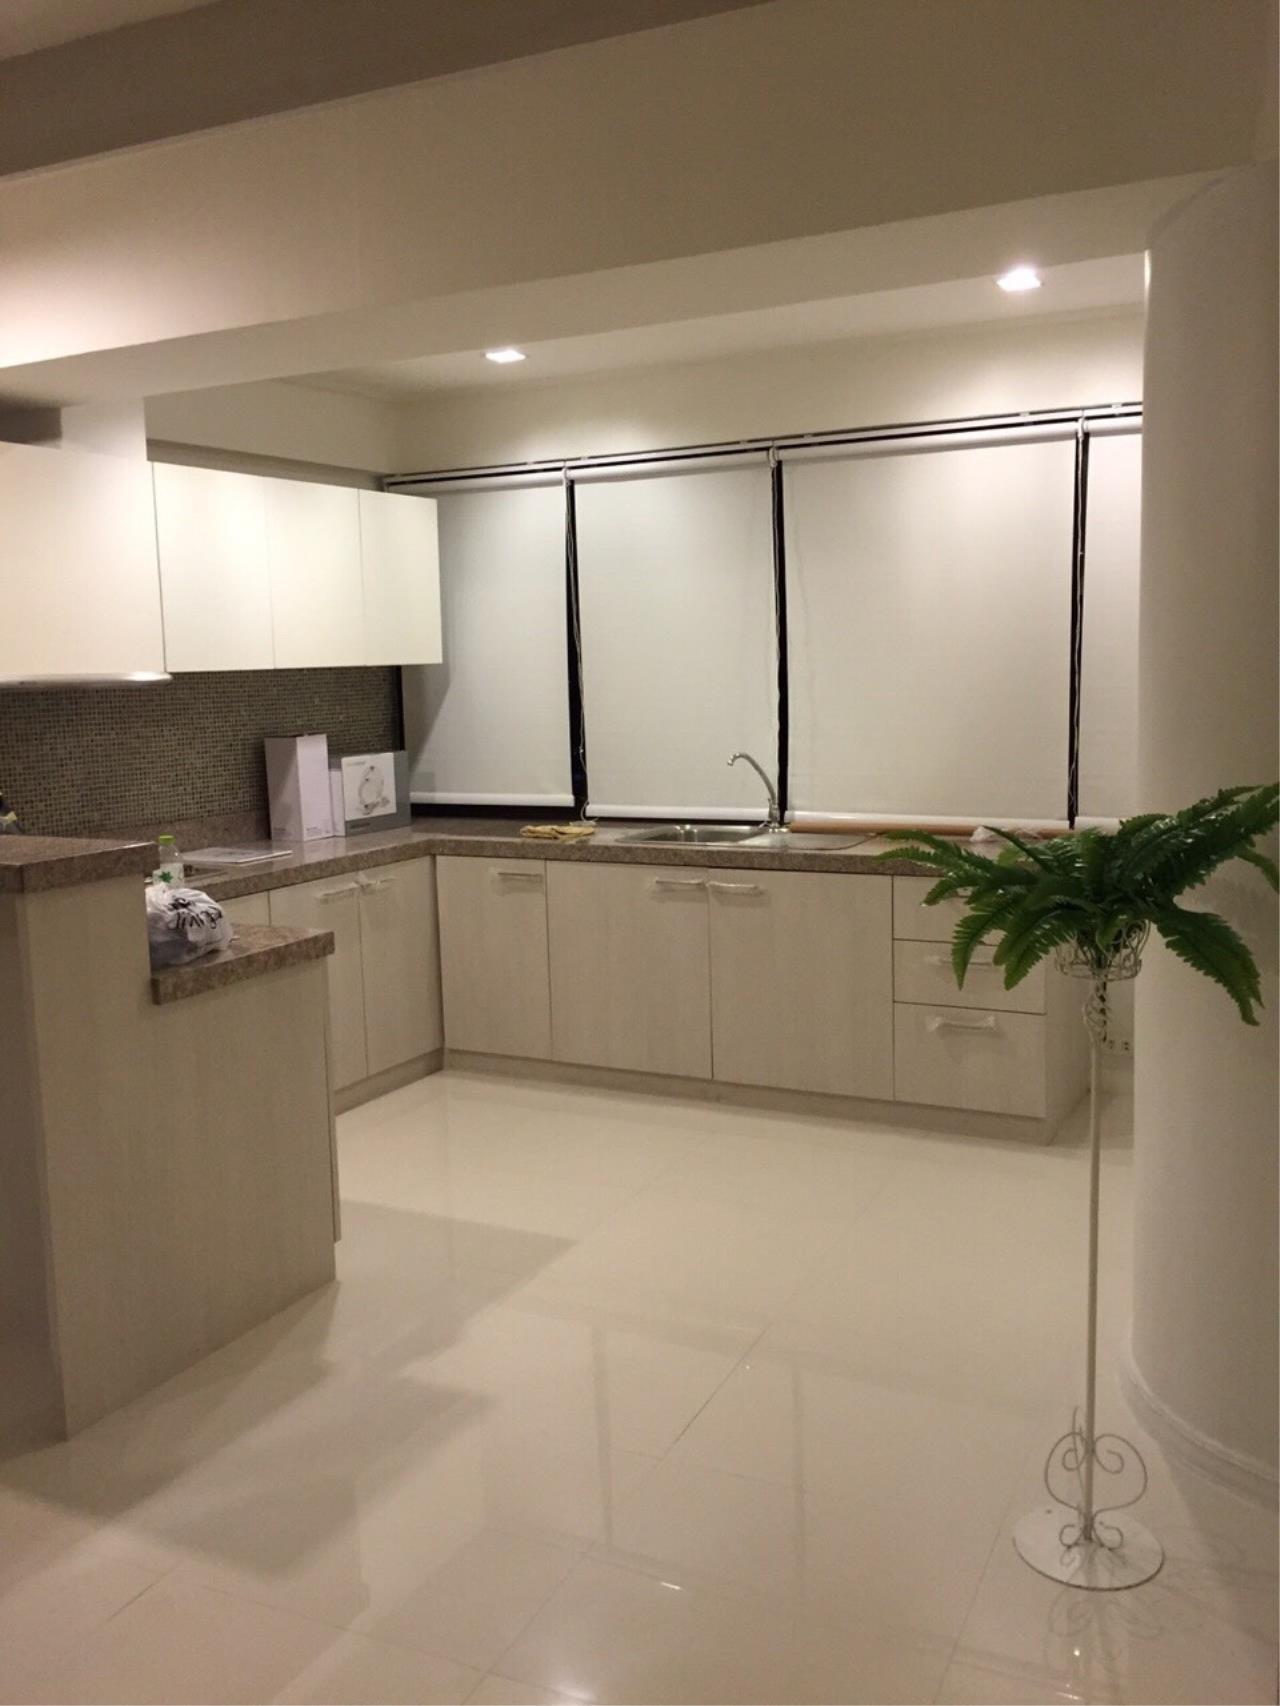 Blueocean property Agency's Condo For Rent – Sunshine Beach Condotel Pattaya 11